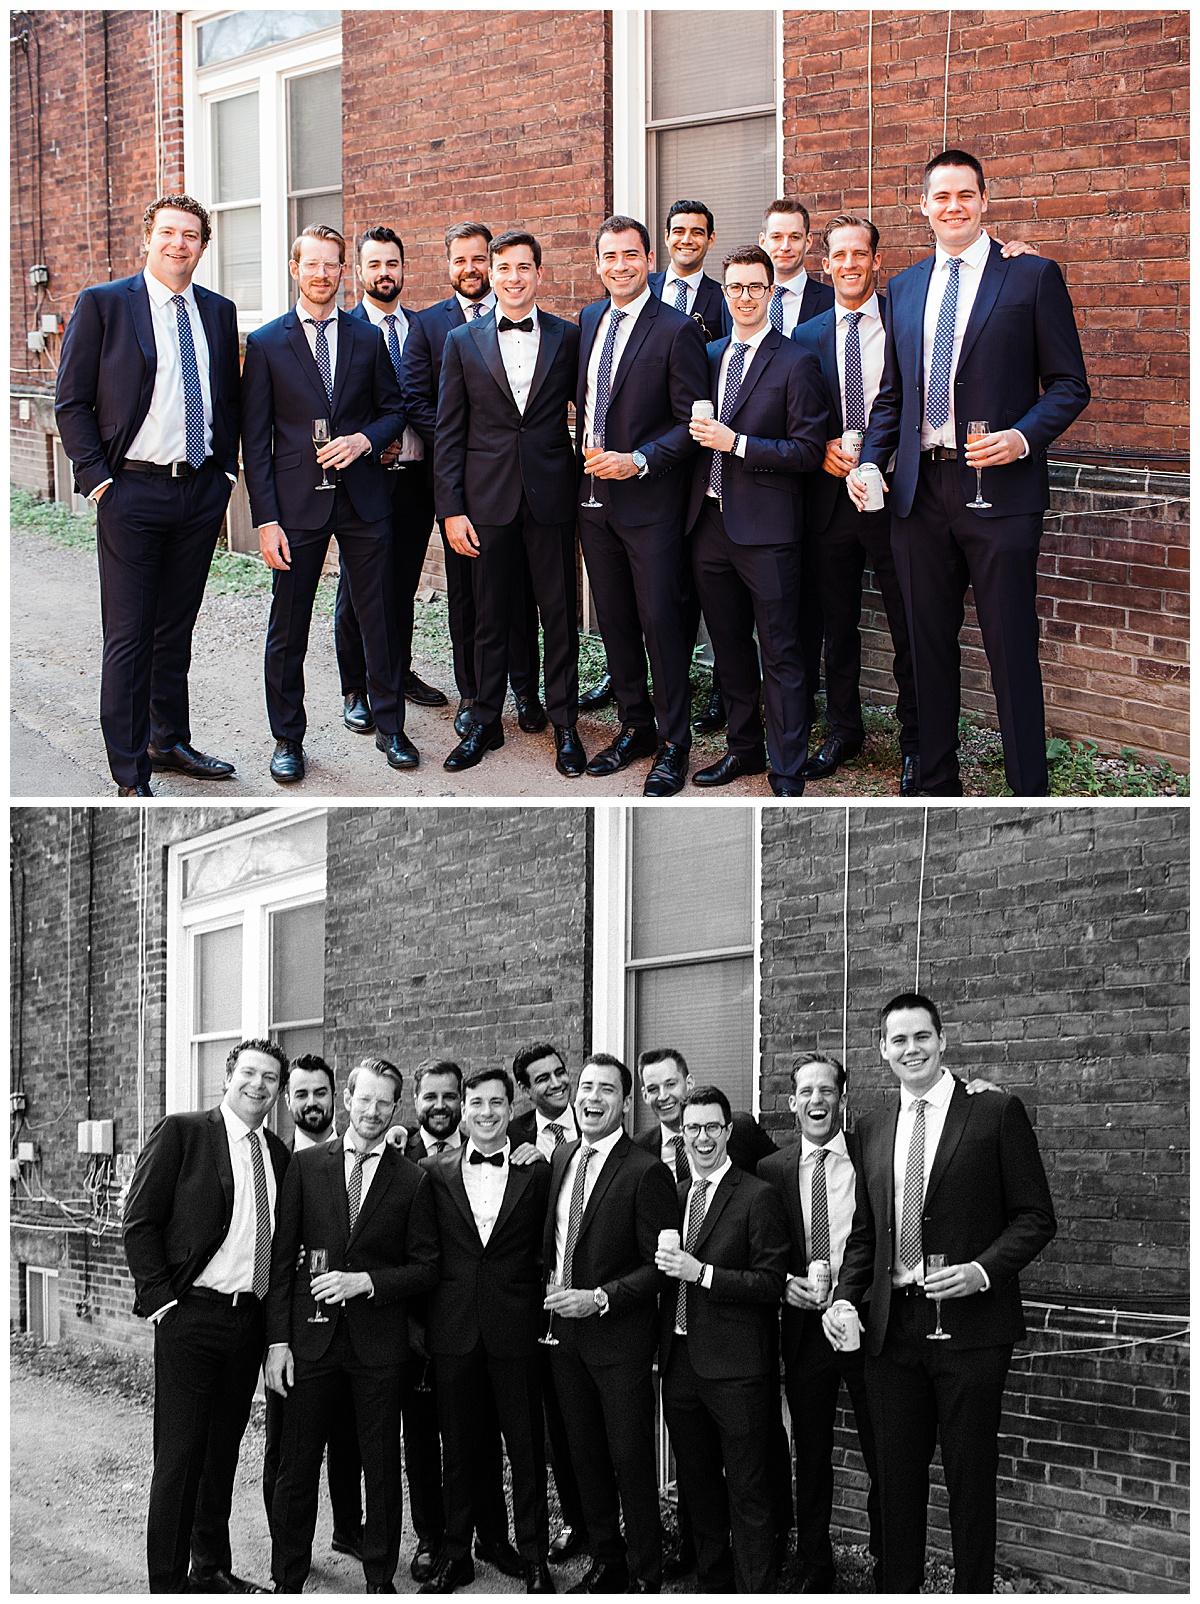 Groom and groomsmen group photo  3photography